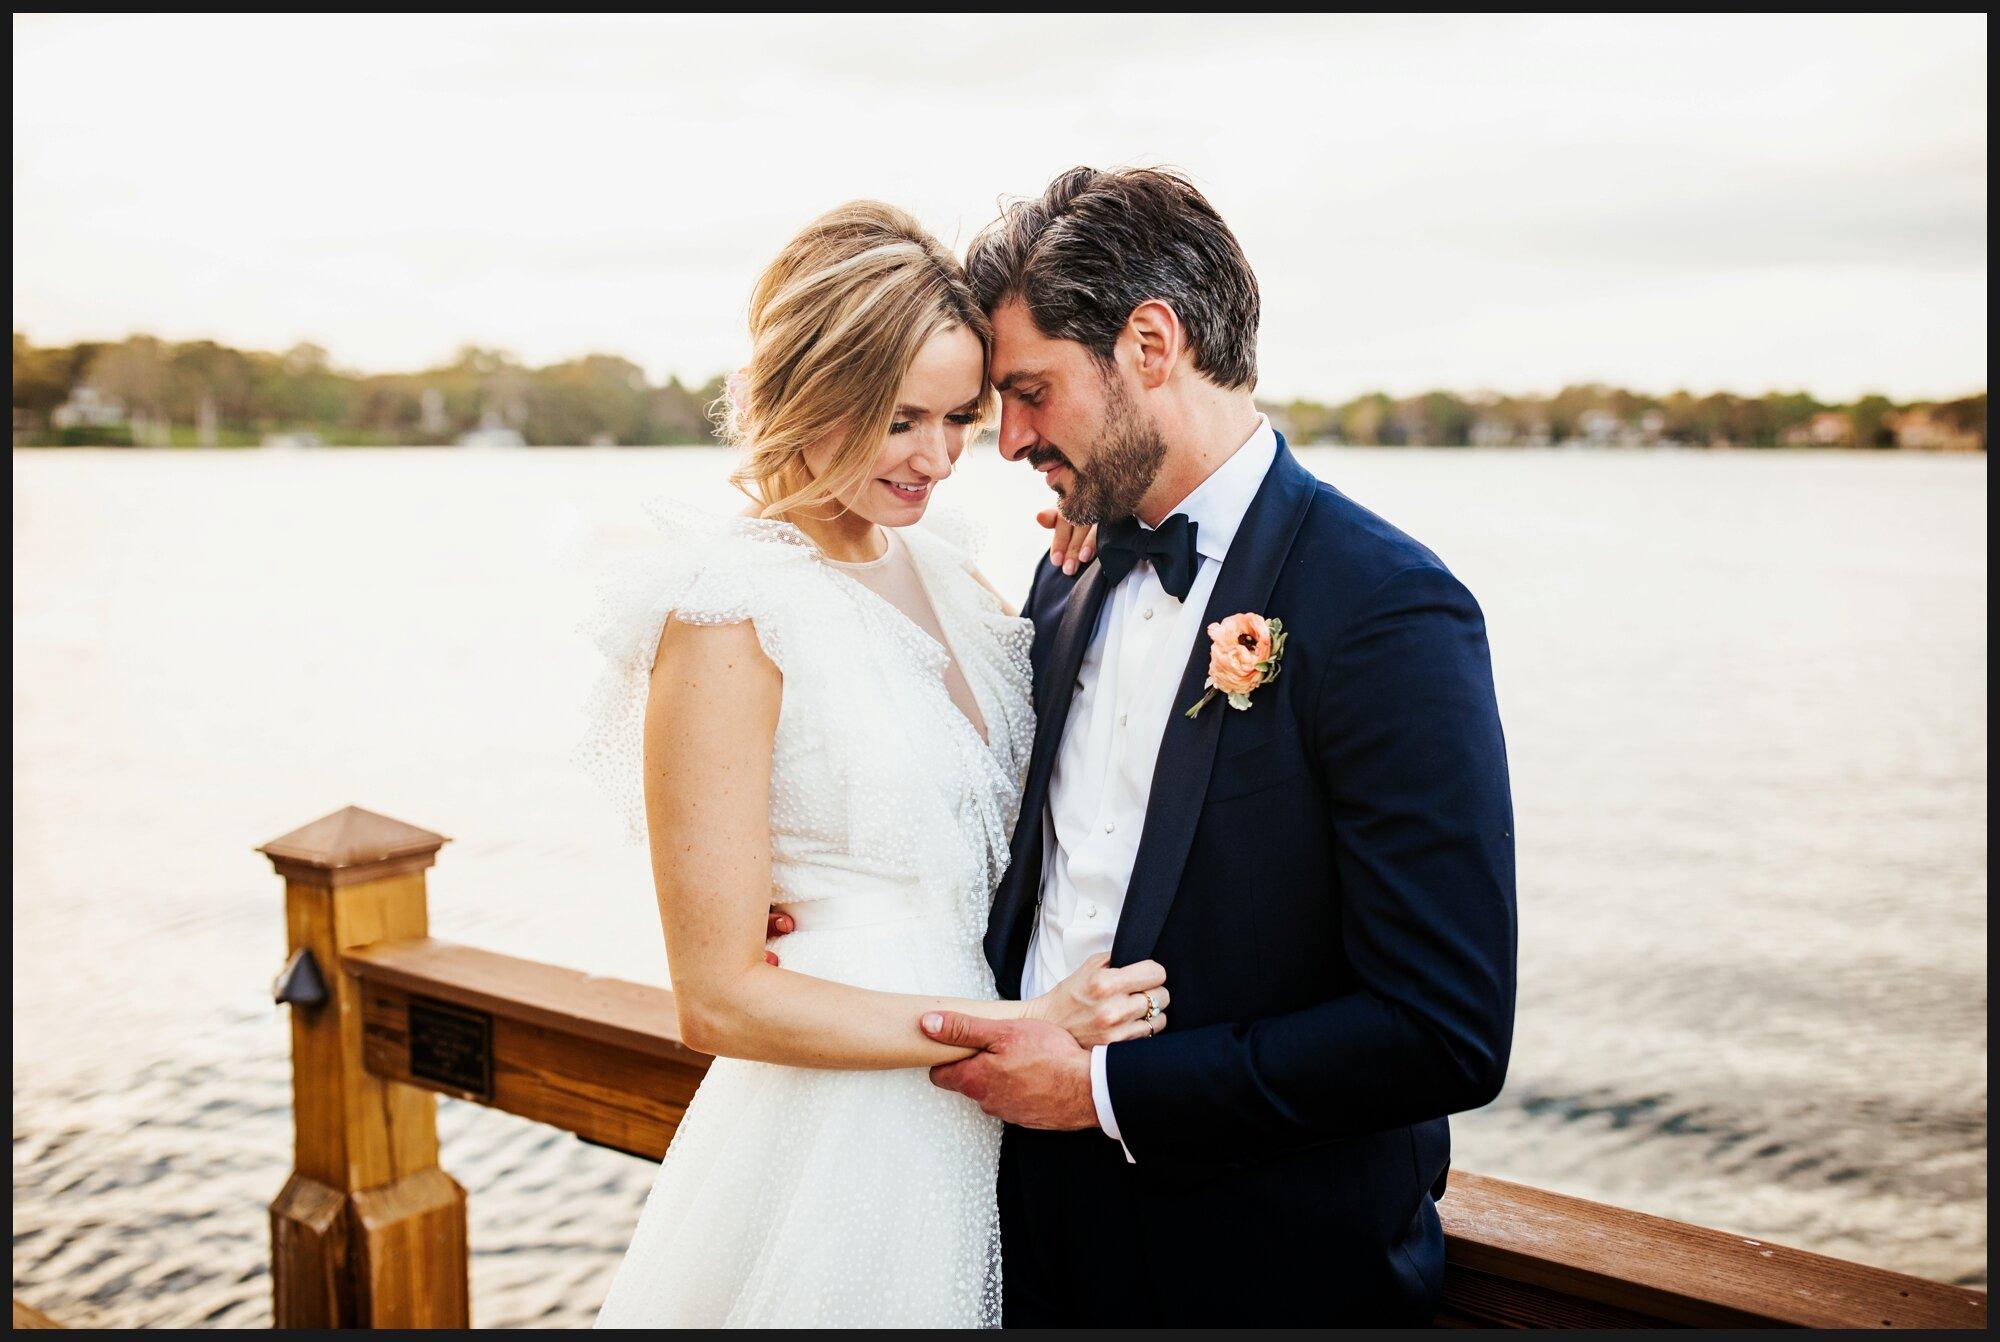 Orlando-Wedding-Photographer-destination-wedding-photographer-florida-wedding-photographer-hawaii-wedding-photographer_0761.jpg